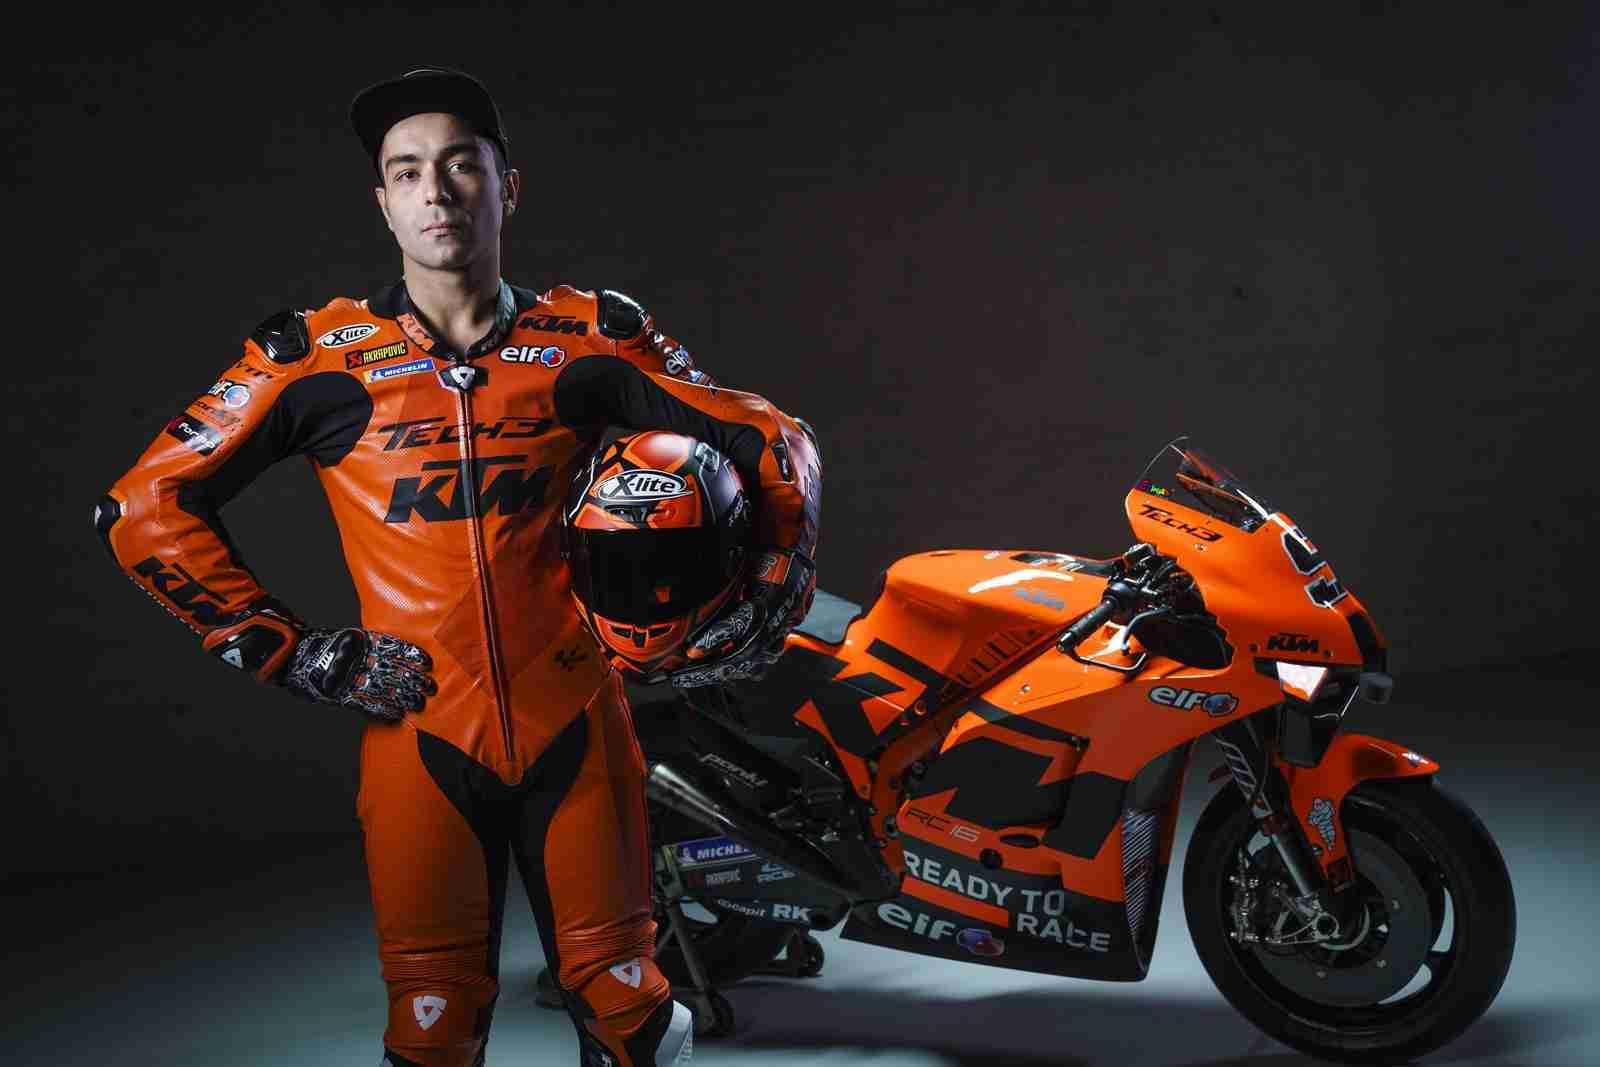 Danilo Petrucci Tech3 KTM Factory Racing MotoGP